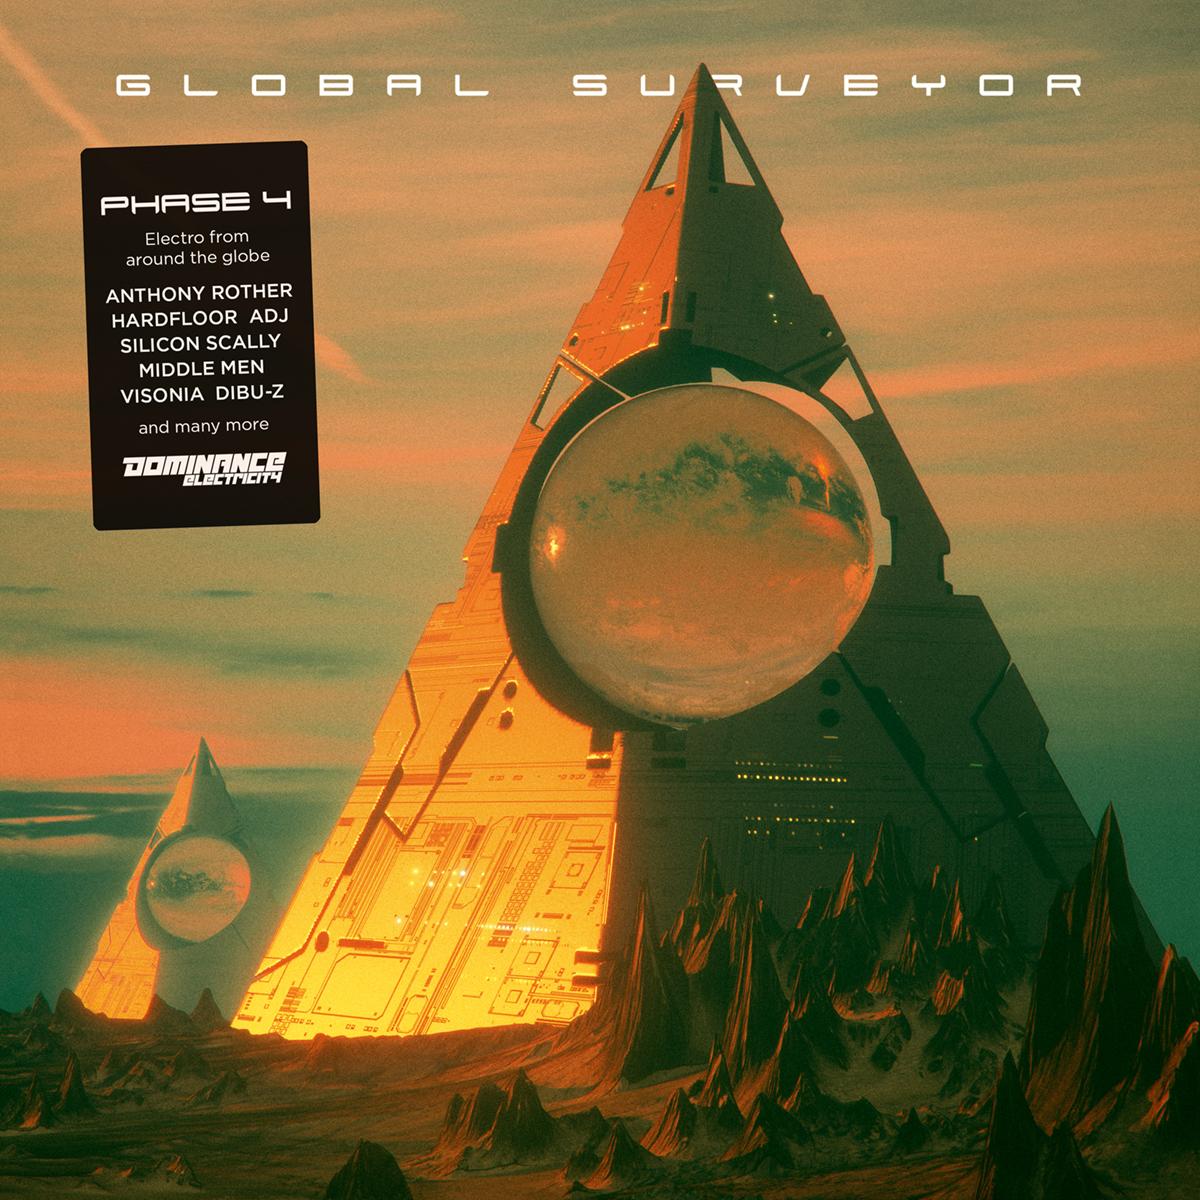 Global Surveyor Phase 4